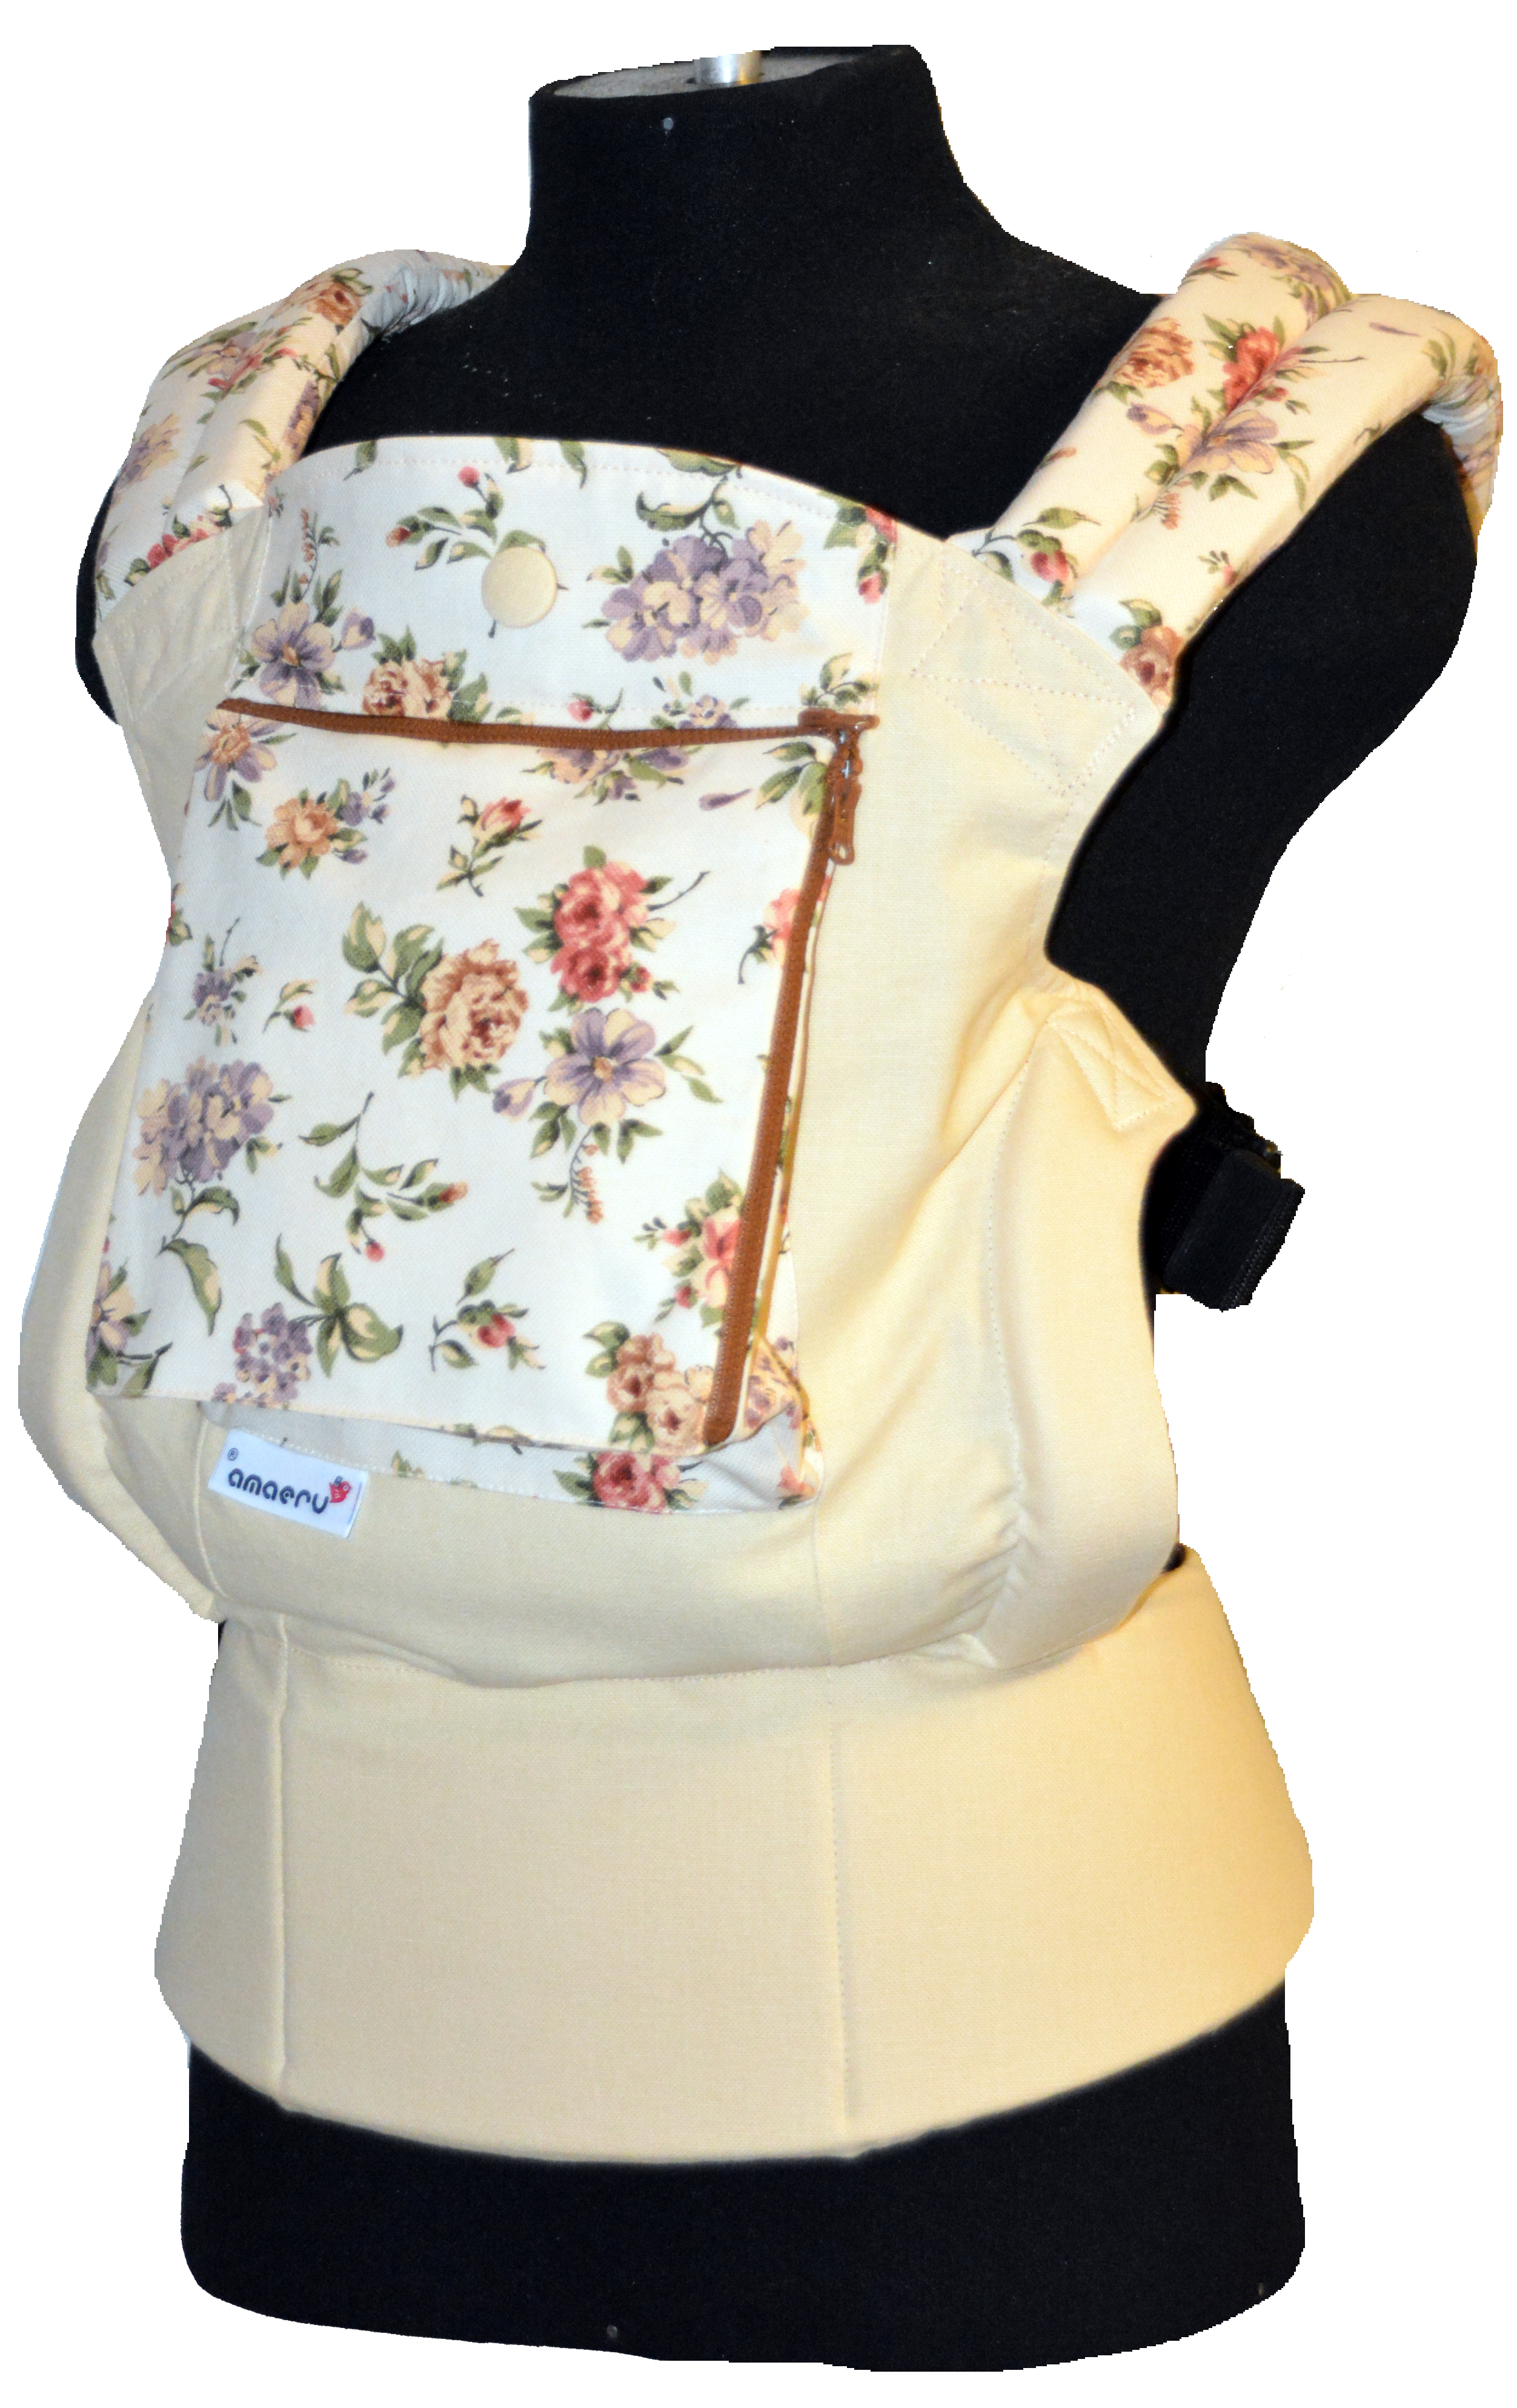 Слинг-рюкзак amar bc009-bag стул рыбака-рюкзак складной